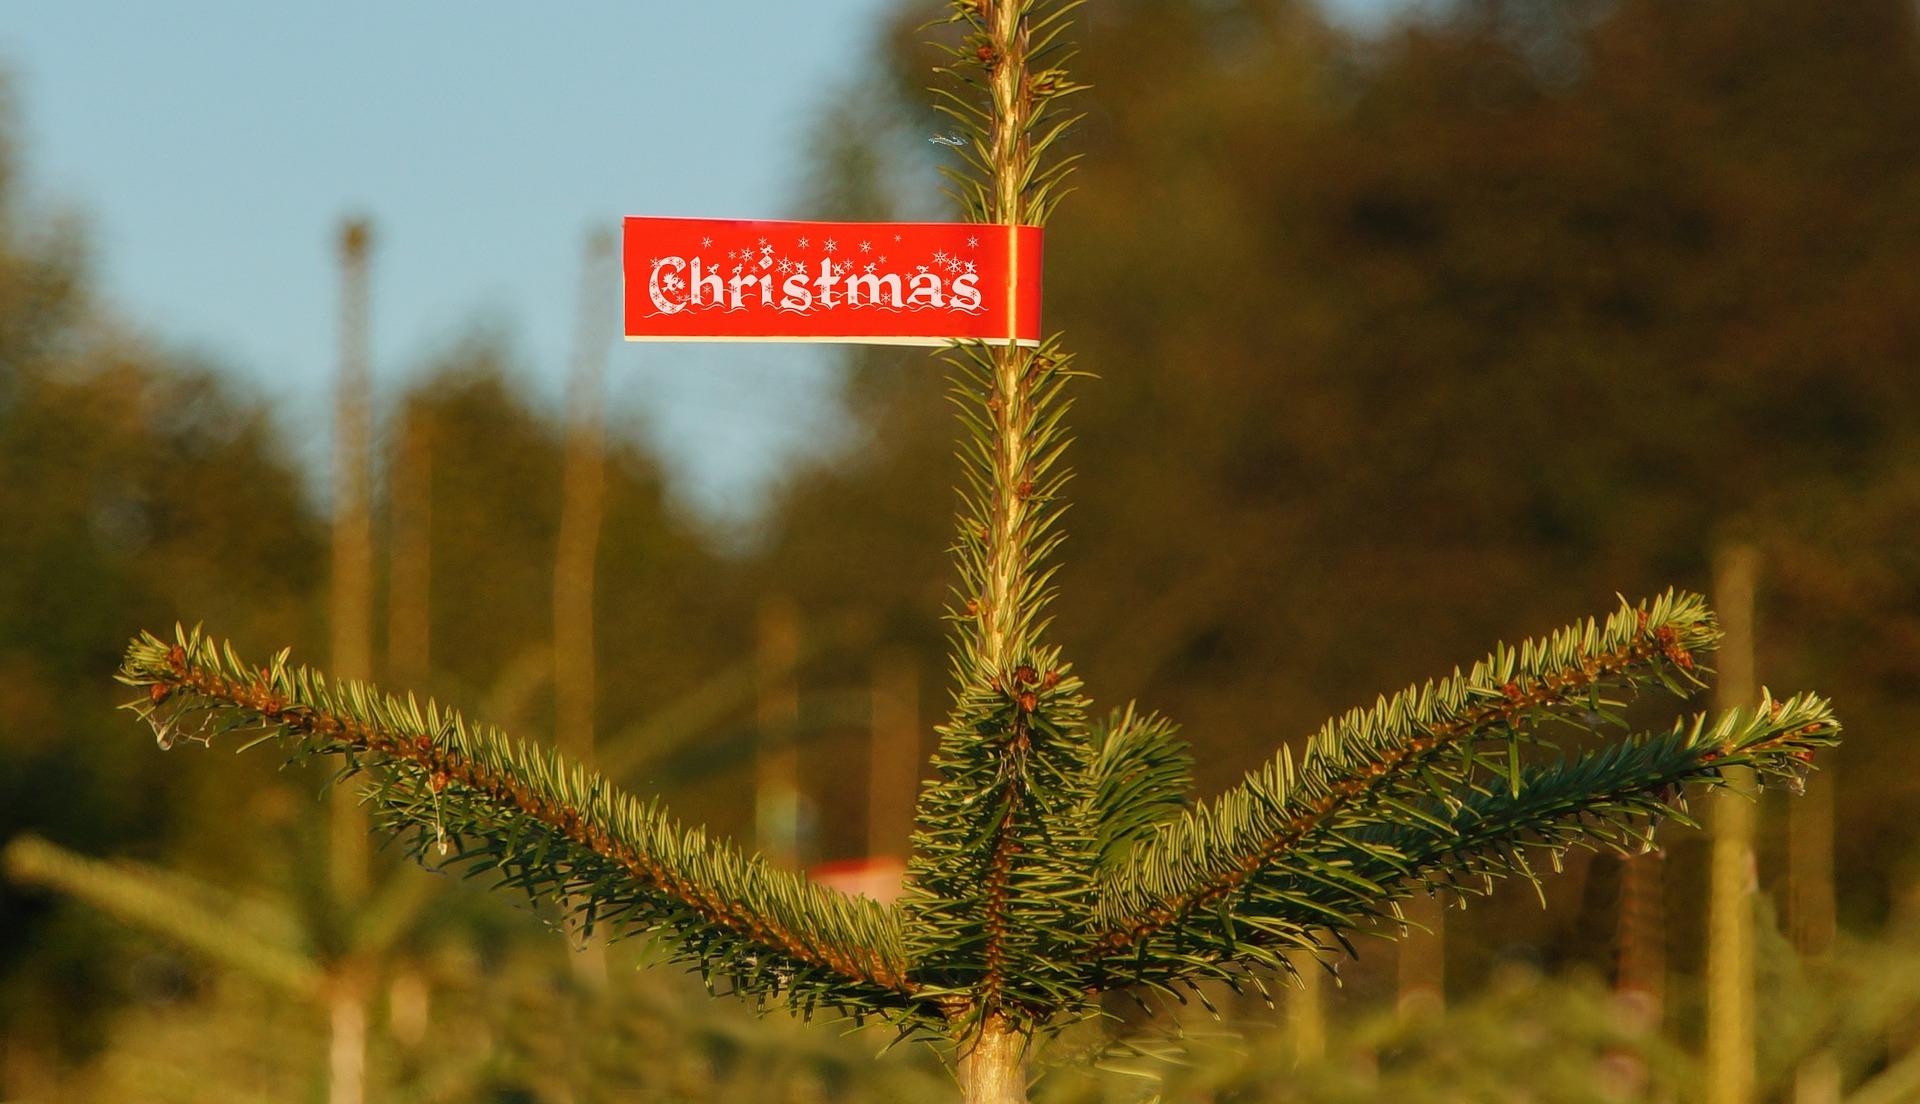 christmas-991807_1920.jpg